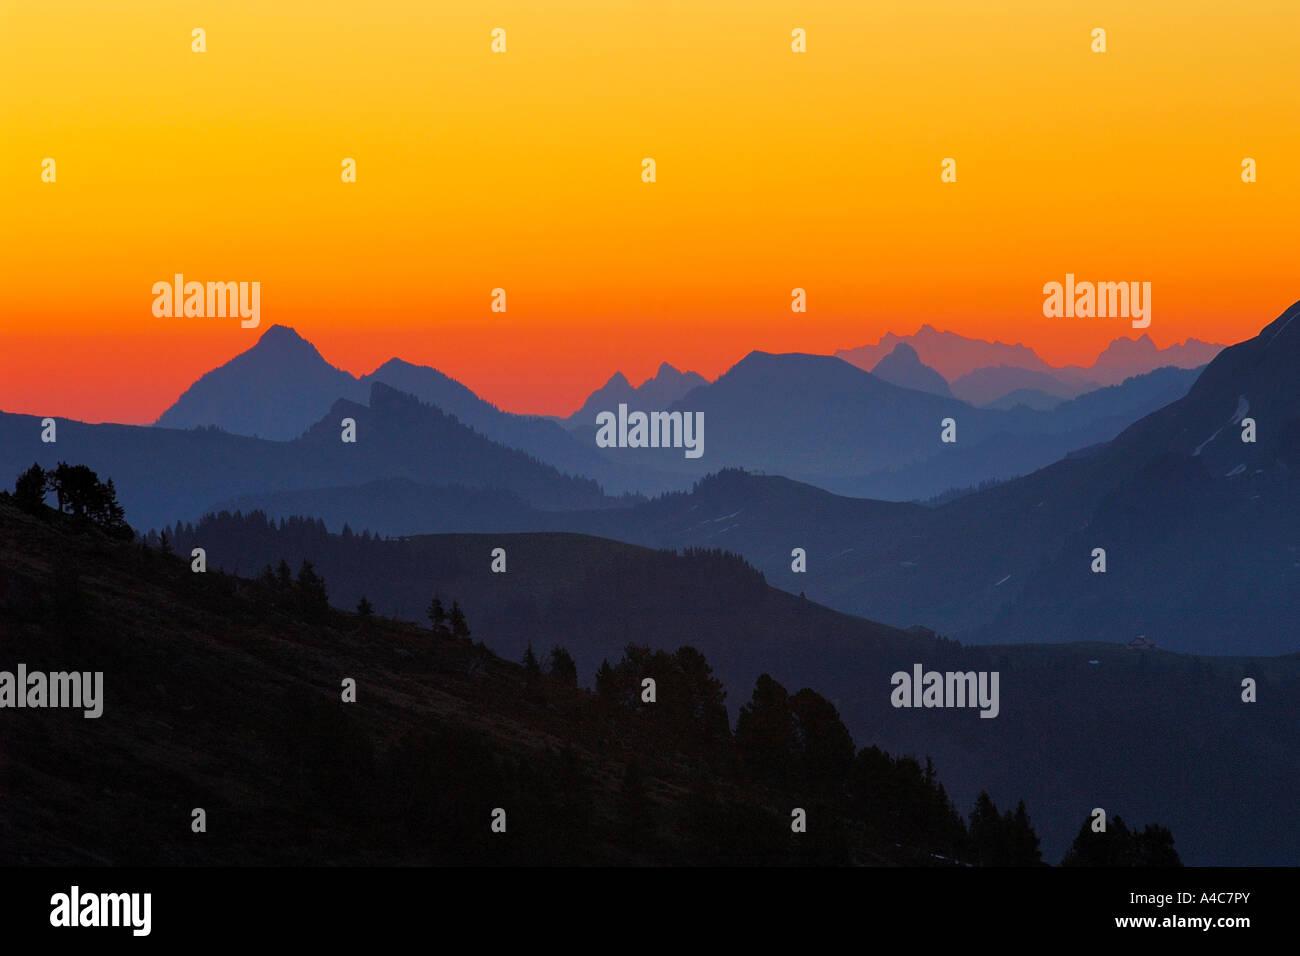 Sonnenaufgang in den Alpen. Schweiz Bern, Berner Oberland Stockbild